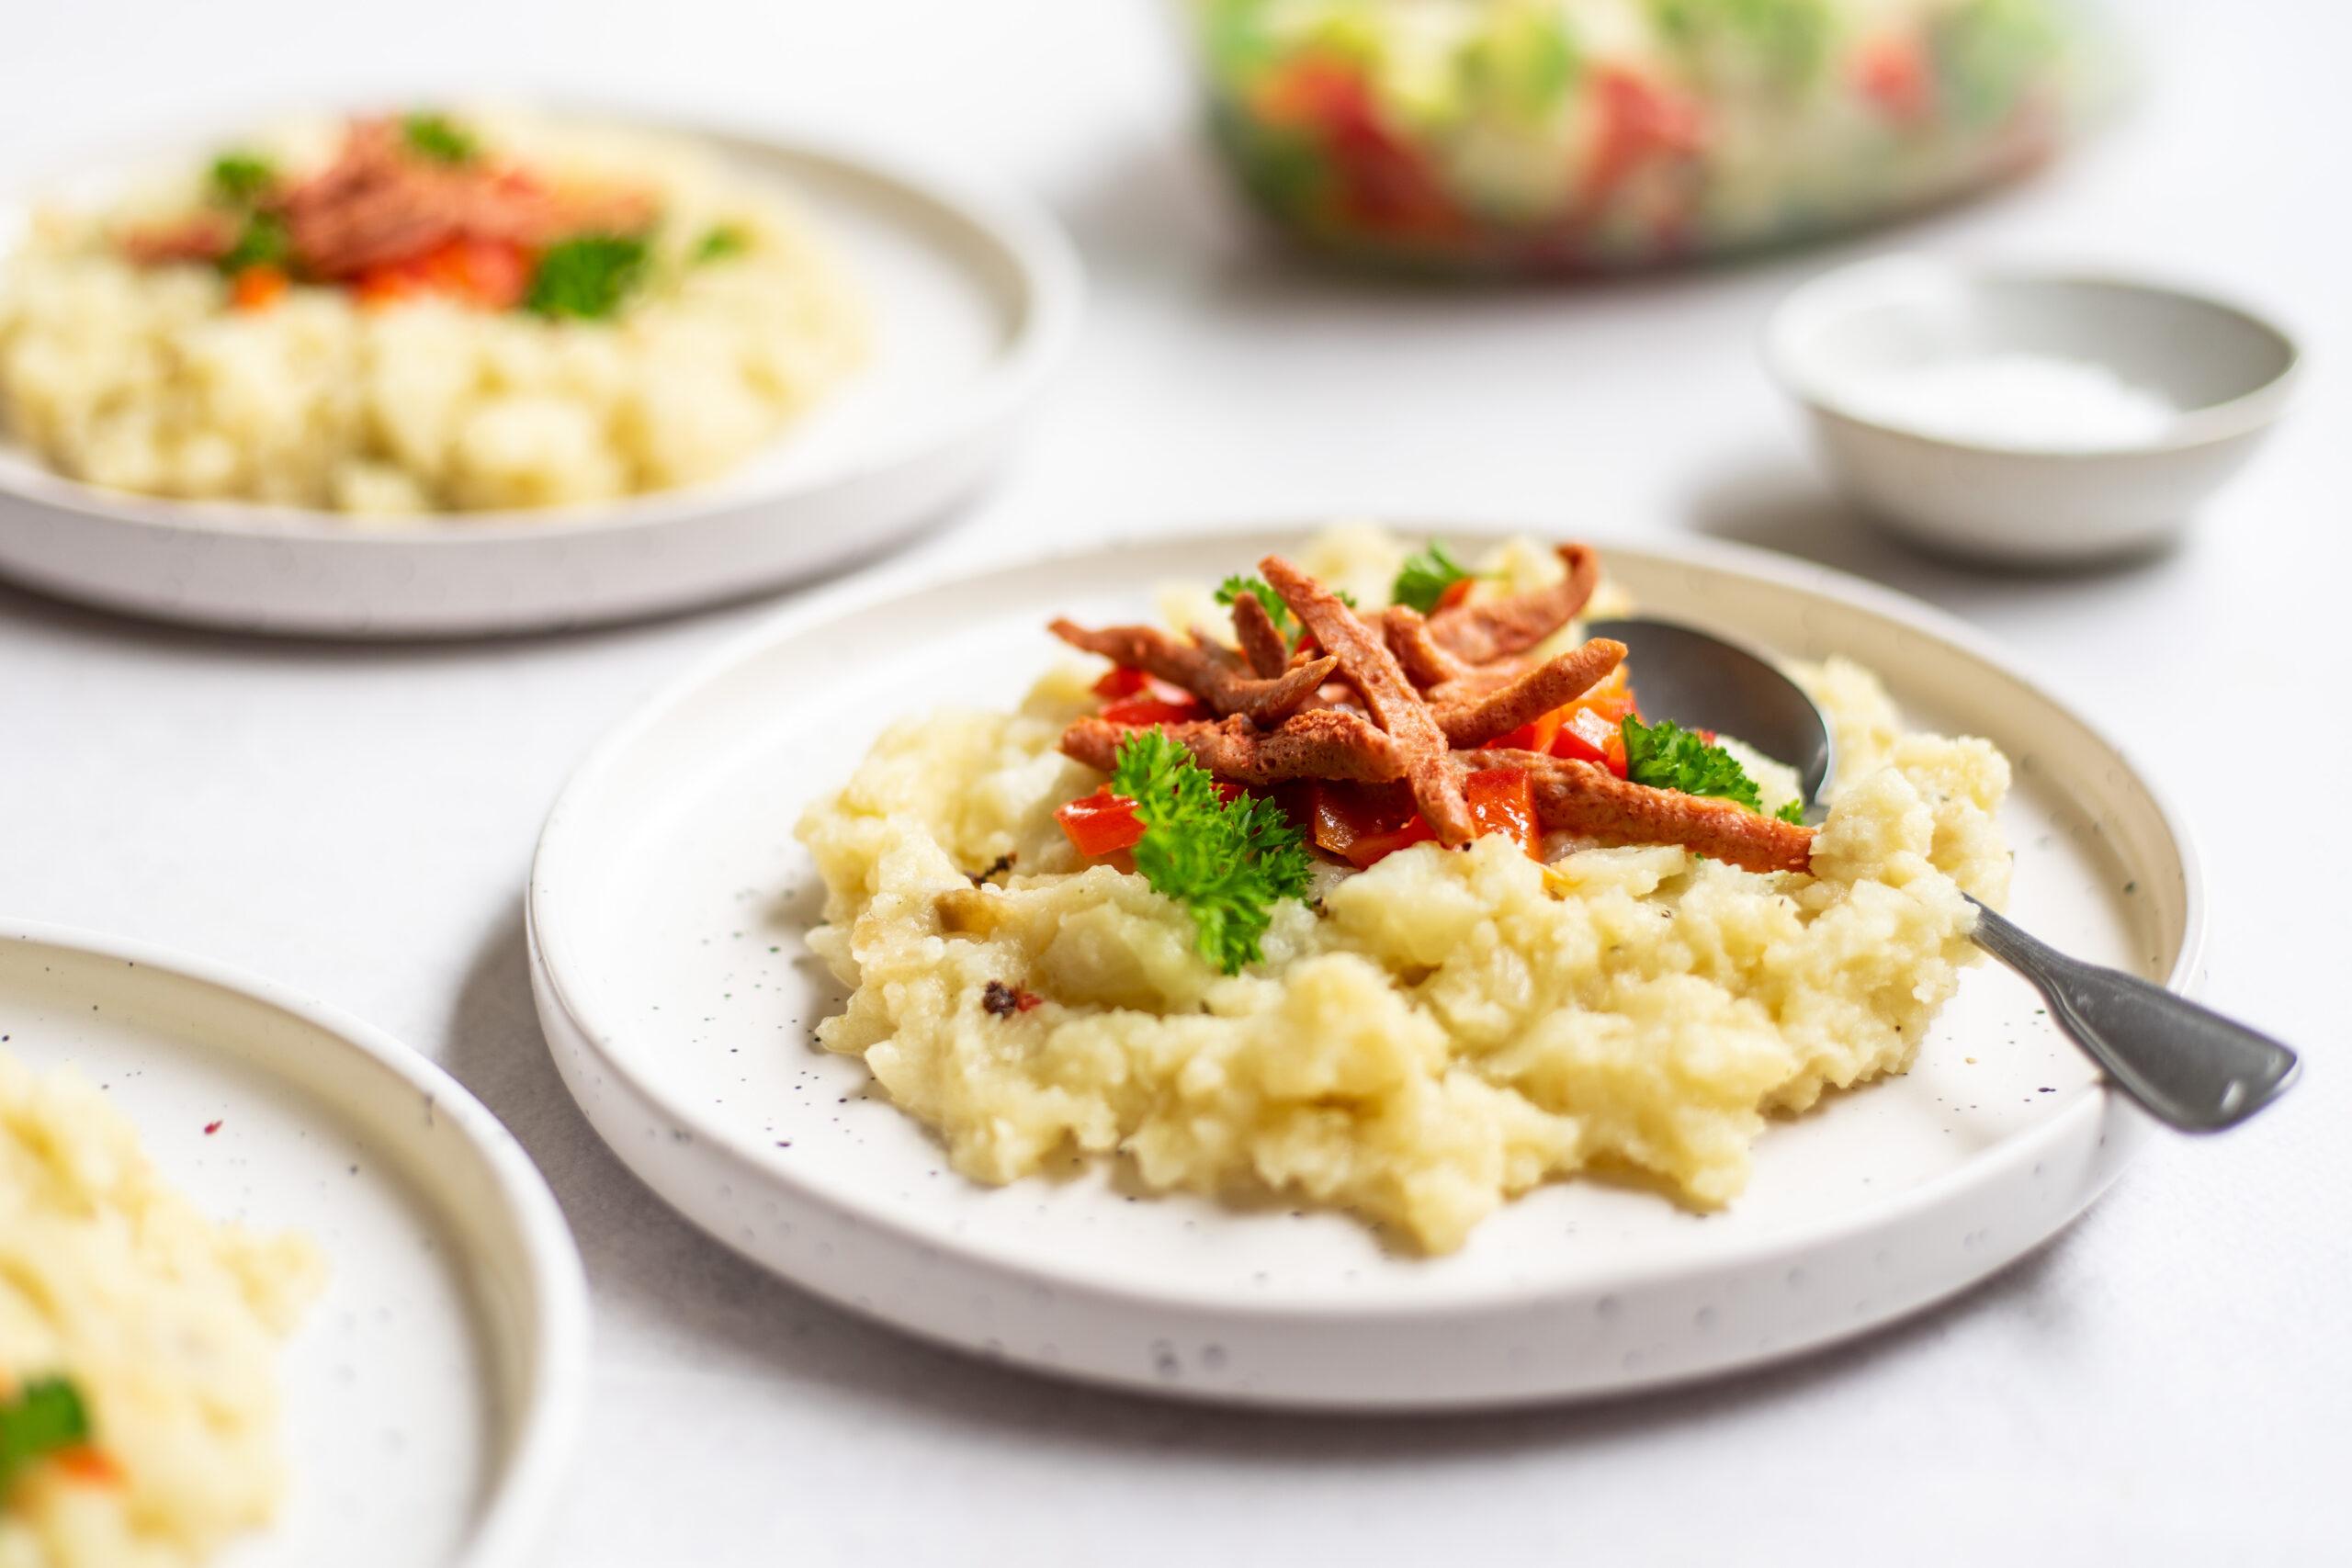 Knolselderijpuree met vegan spekjes en paprika